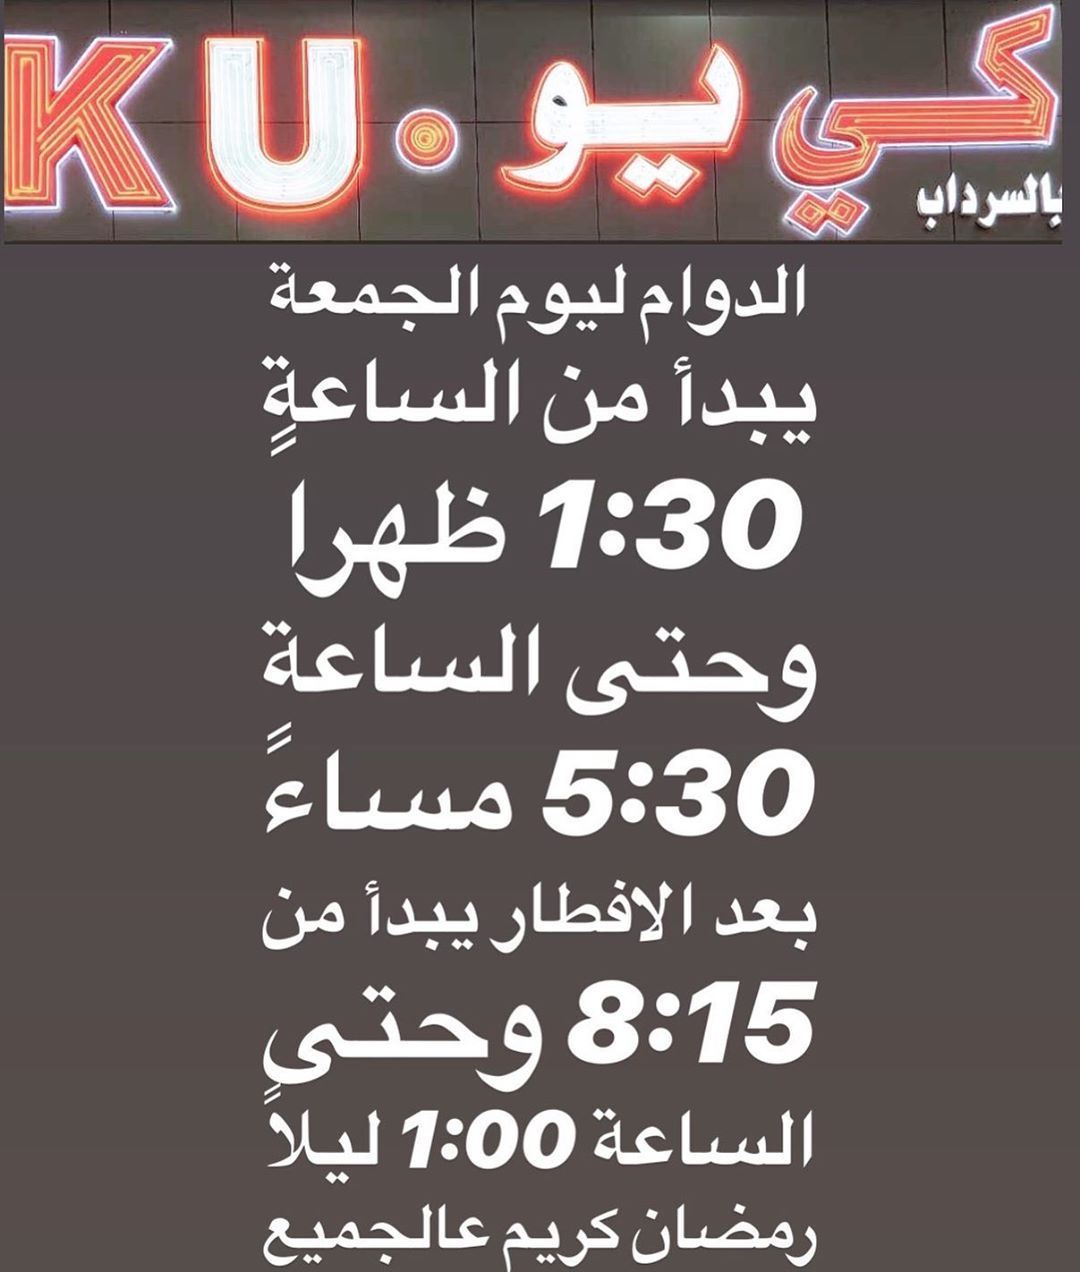 سوق كي يو الضجيج مكان المرور سابقا خلف ستي سنتر New Ku Fashion Dajeej Kuwaitcity Kuwaitpic Kuwaitinsta Kuwait Kuwaitinstagram Fashion Model Da